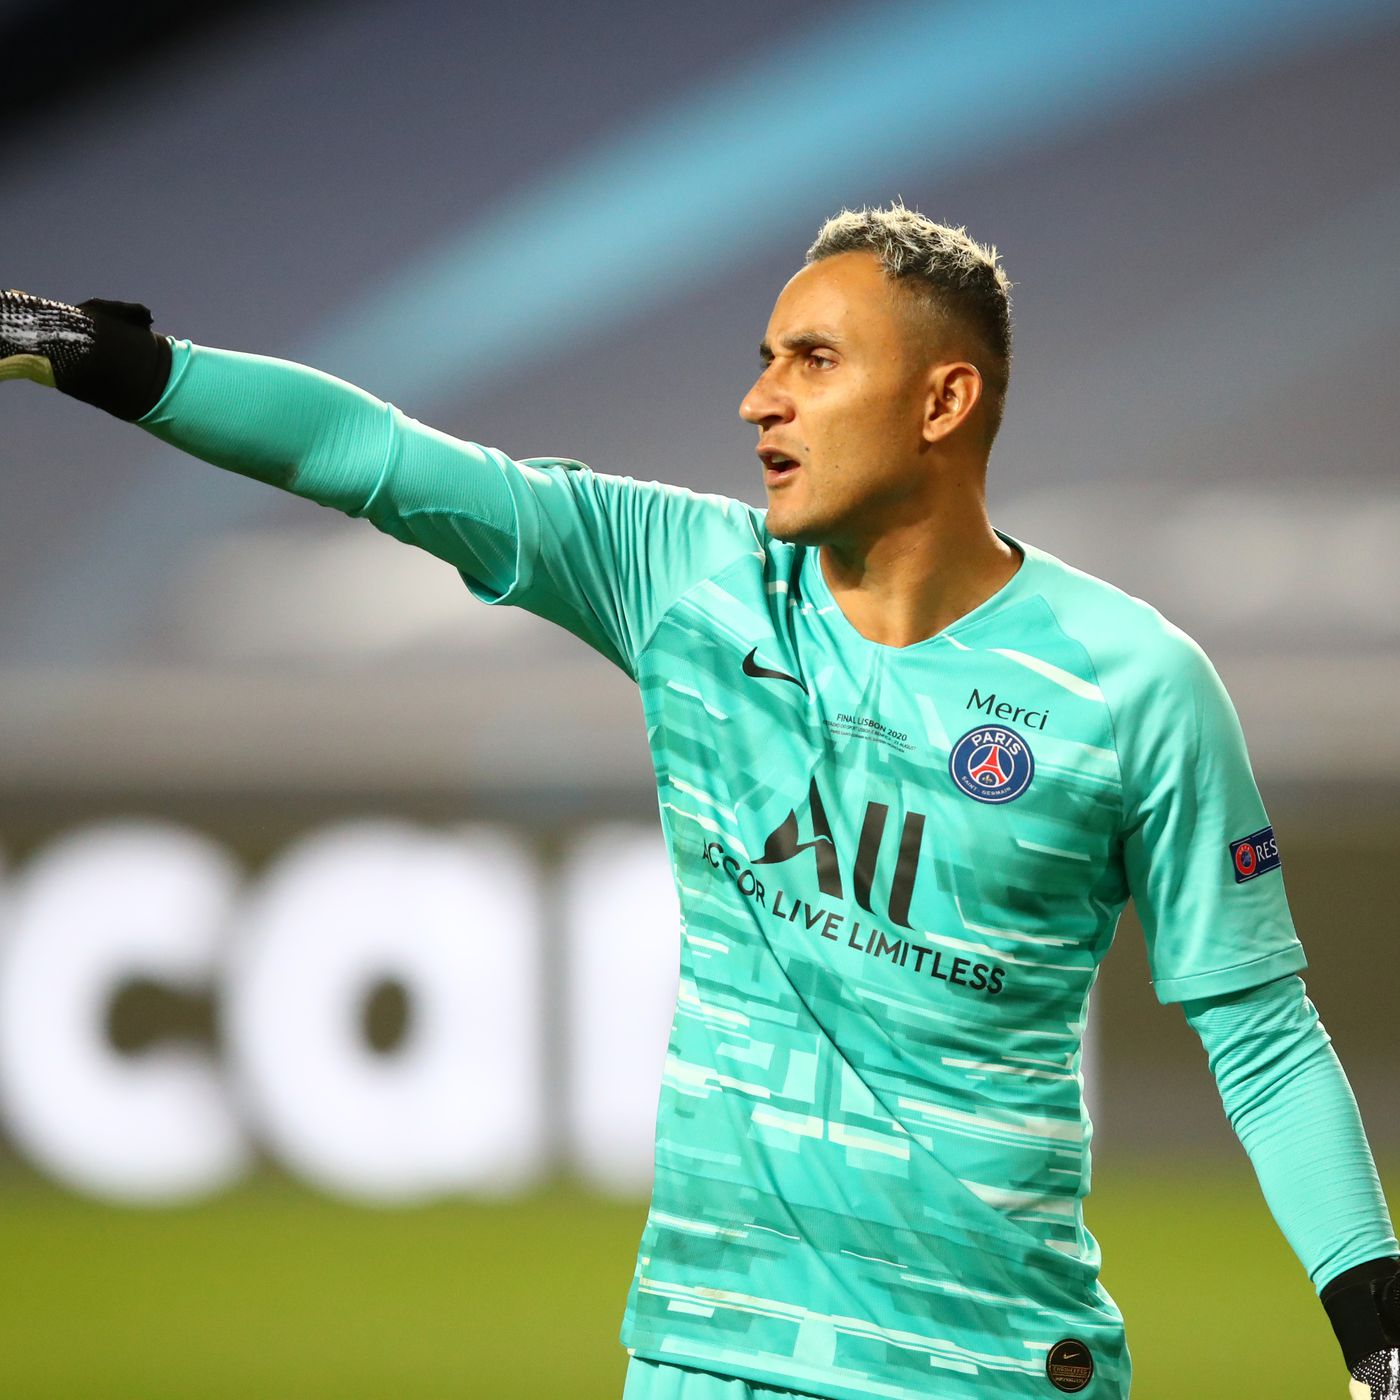 Brankáři Ligue1